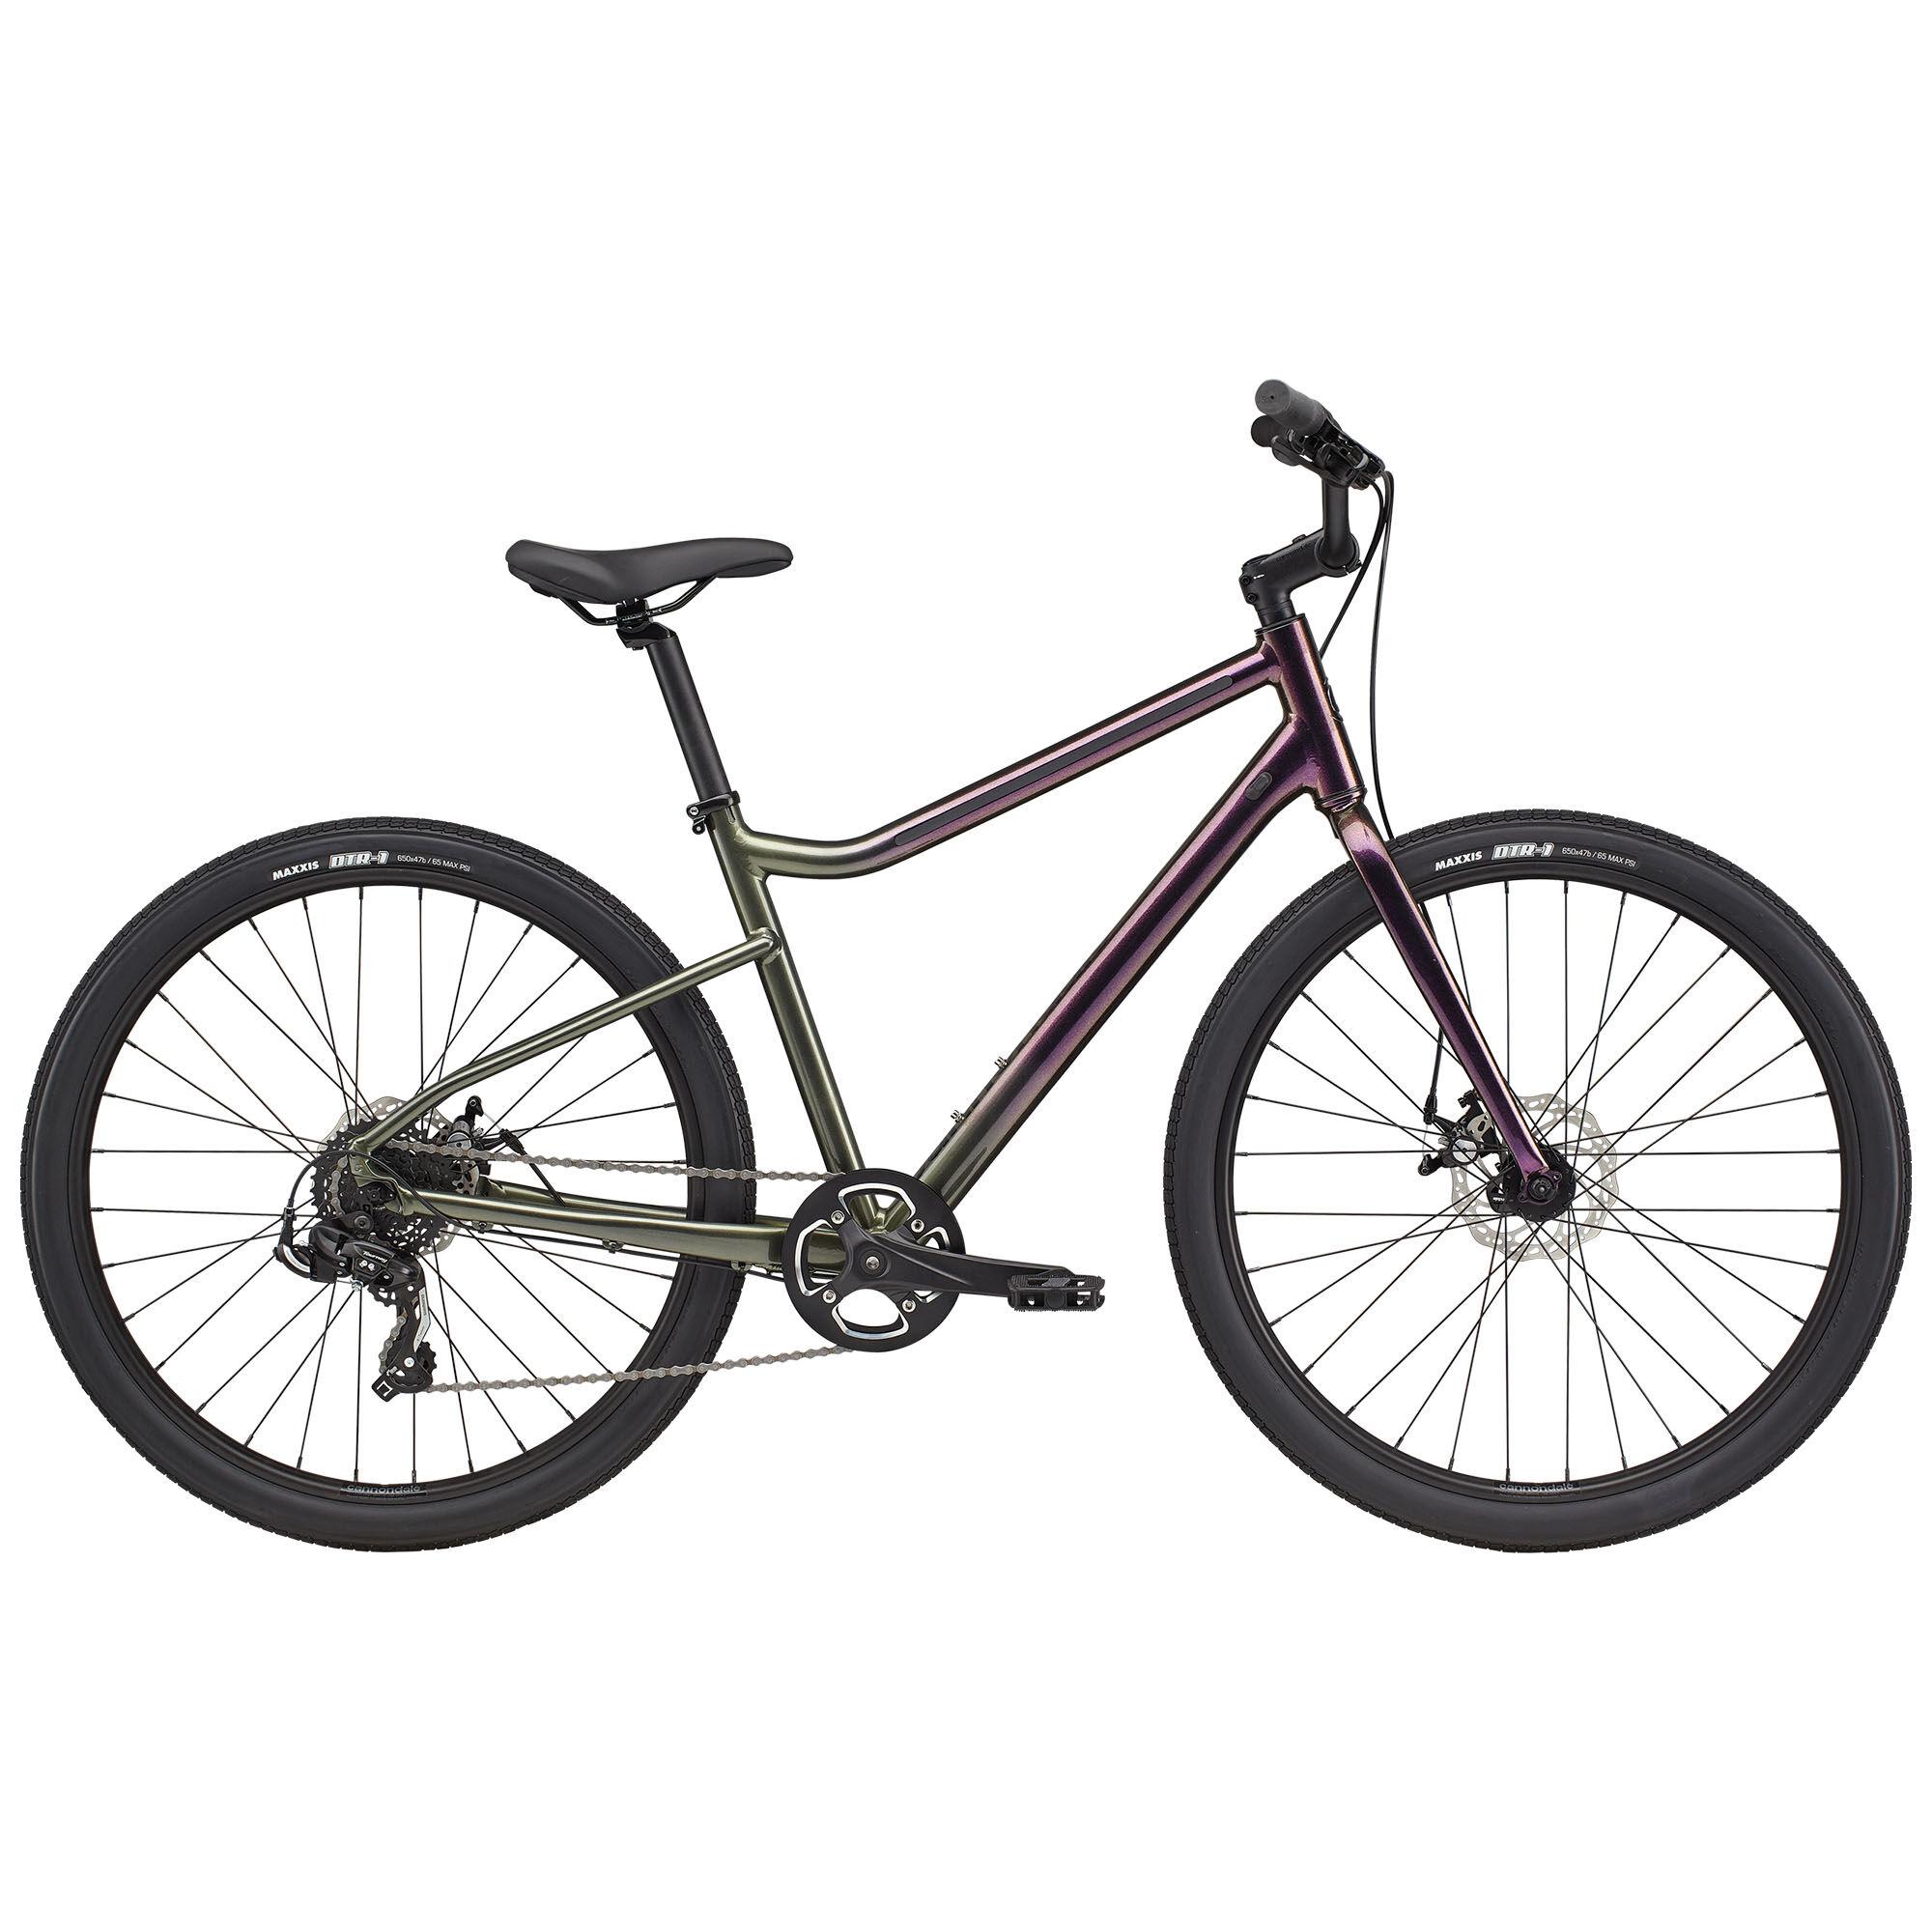 Cannondale Treadwell 3 LTD Urban Bike '21  - Highlighter - Size: Medium